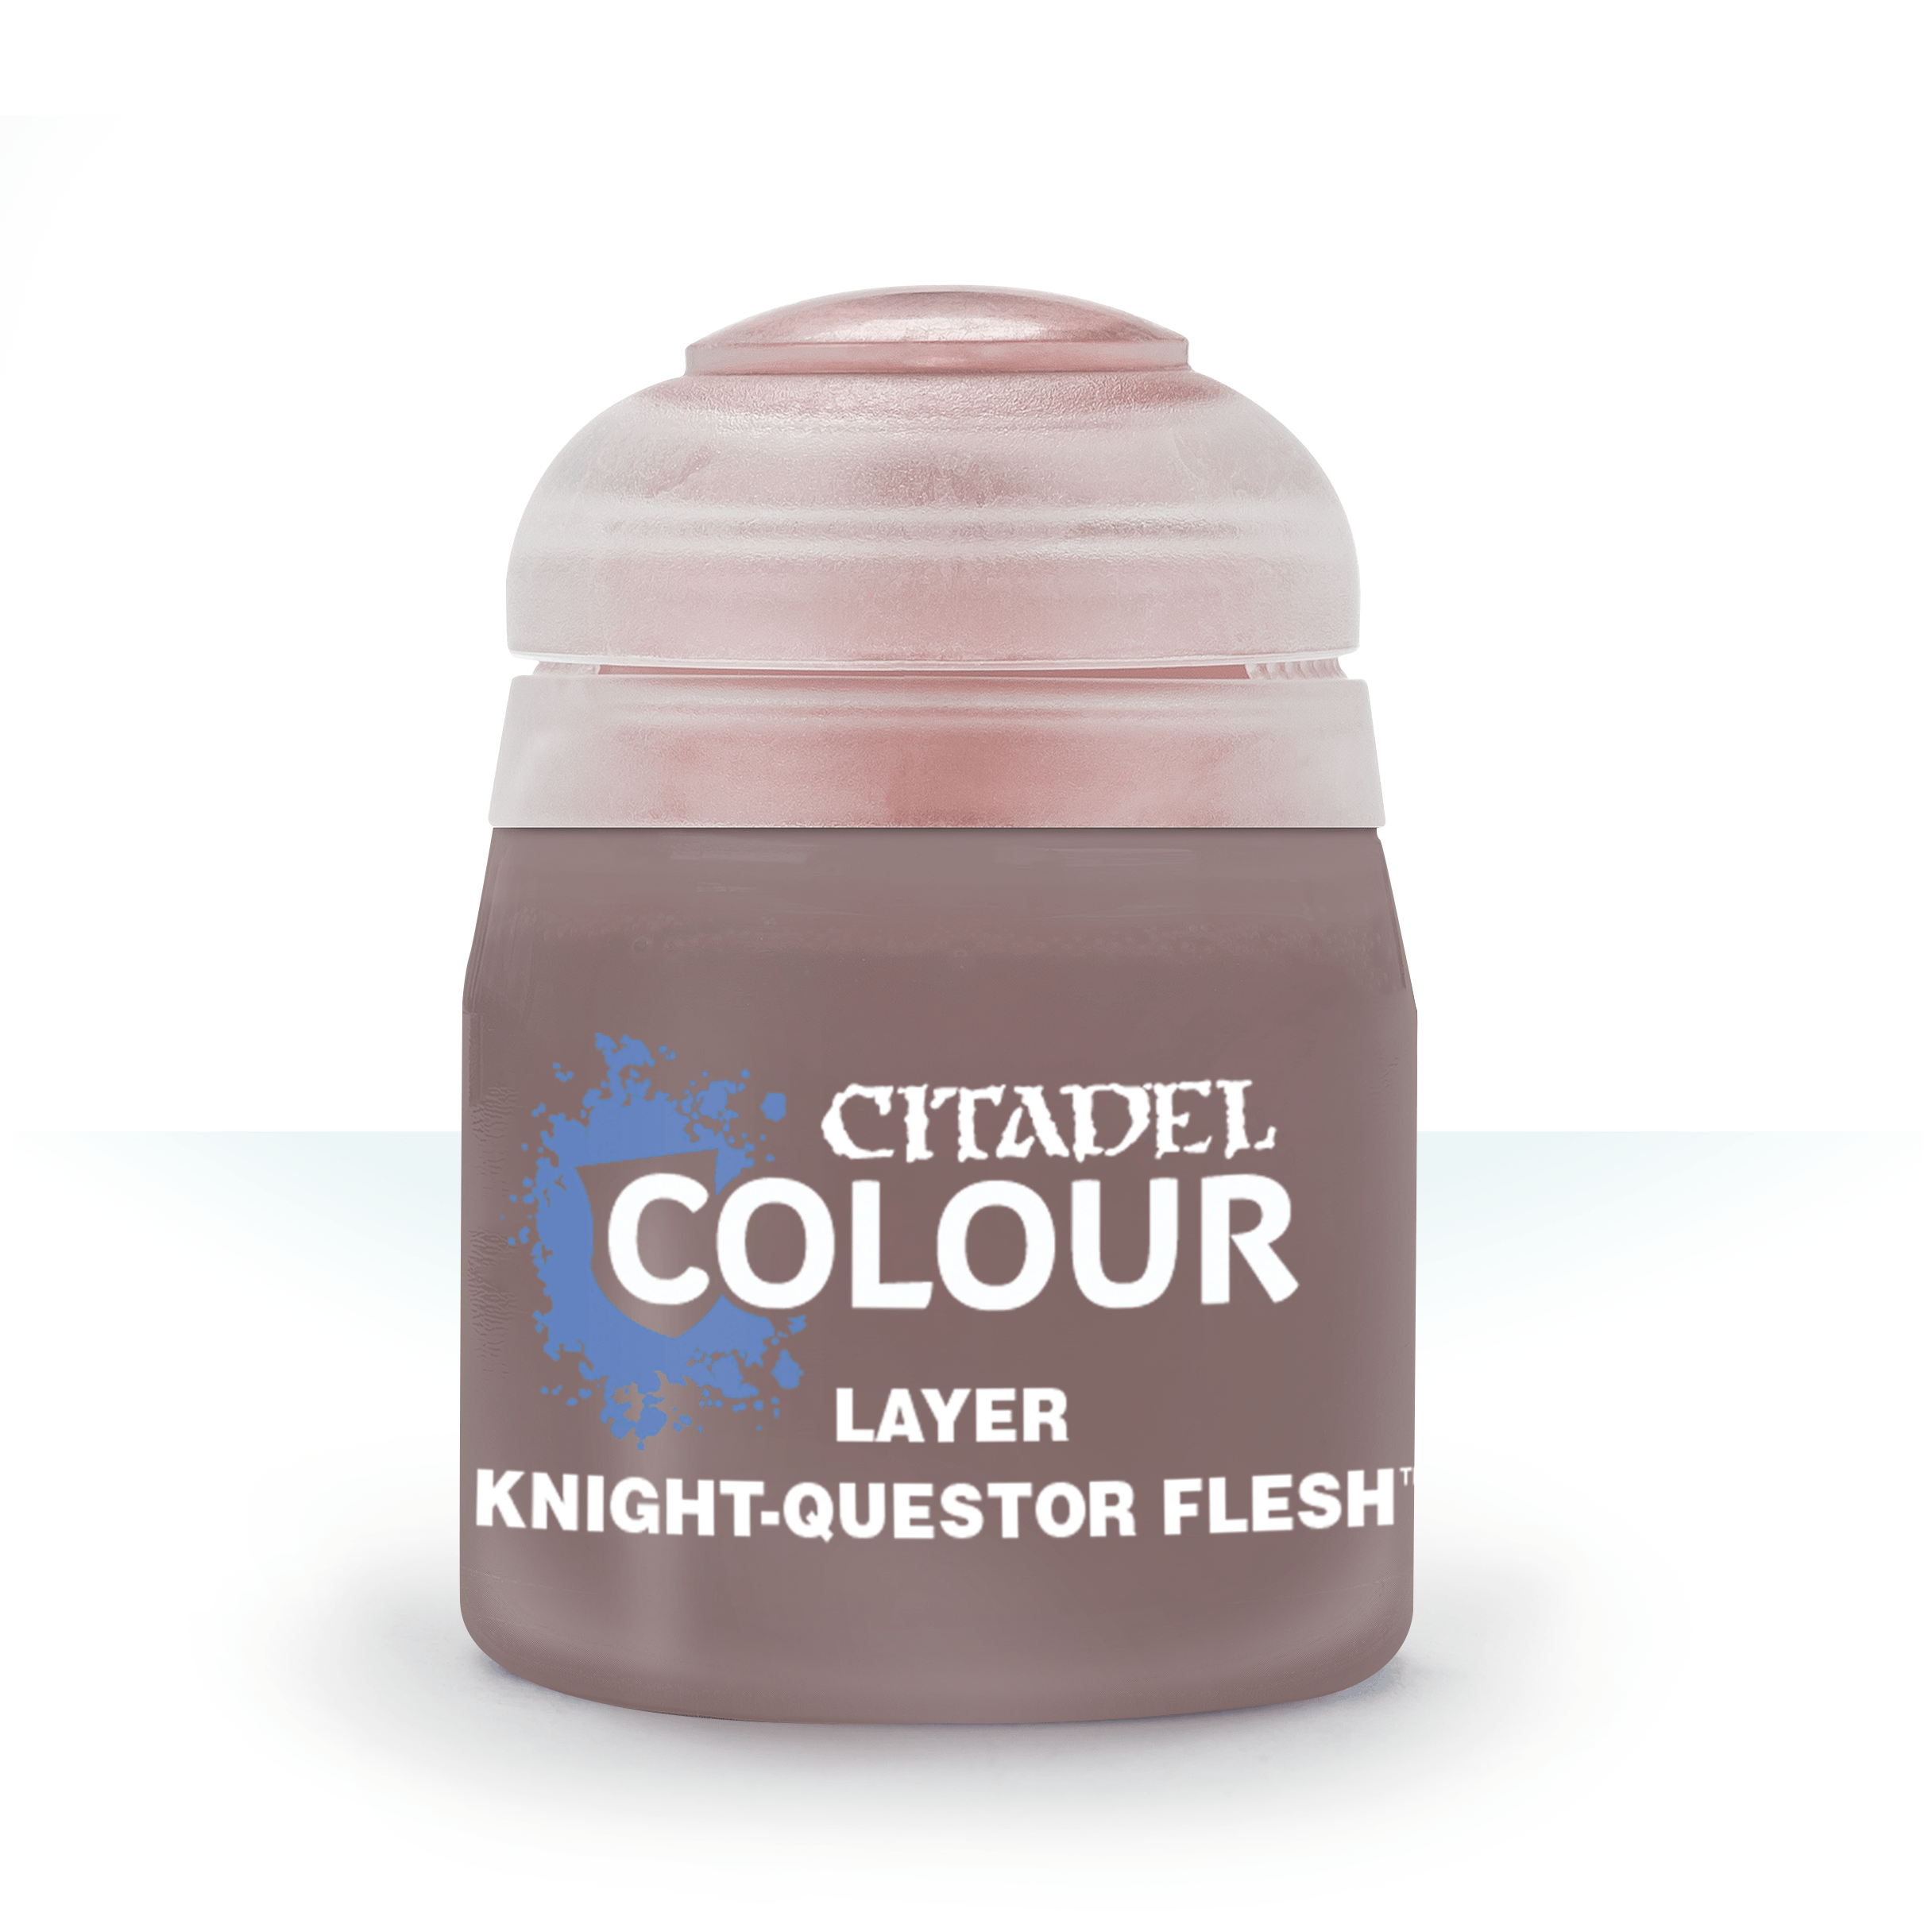 Knight-Questor Flesh, Citadel Layer 12ml